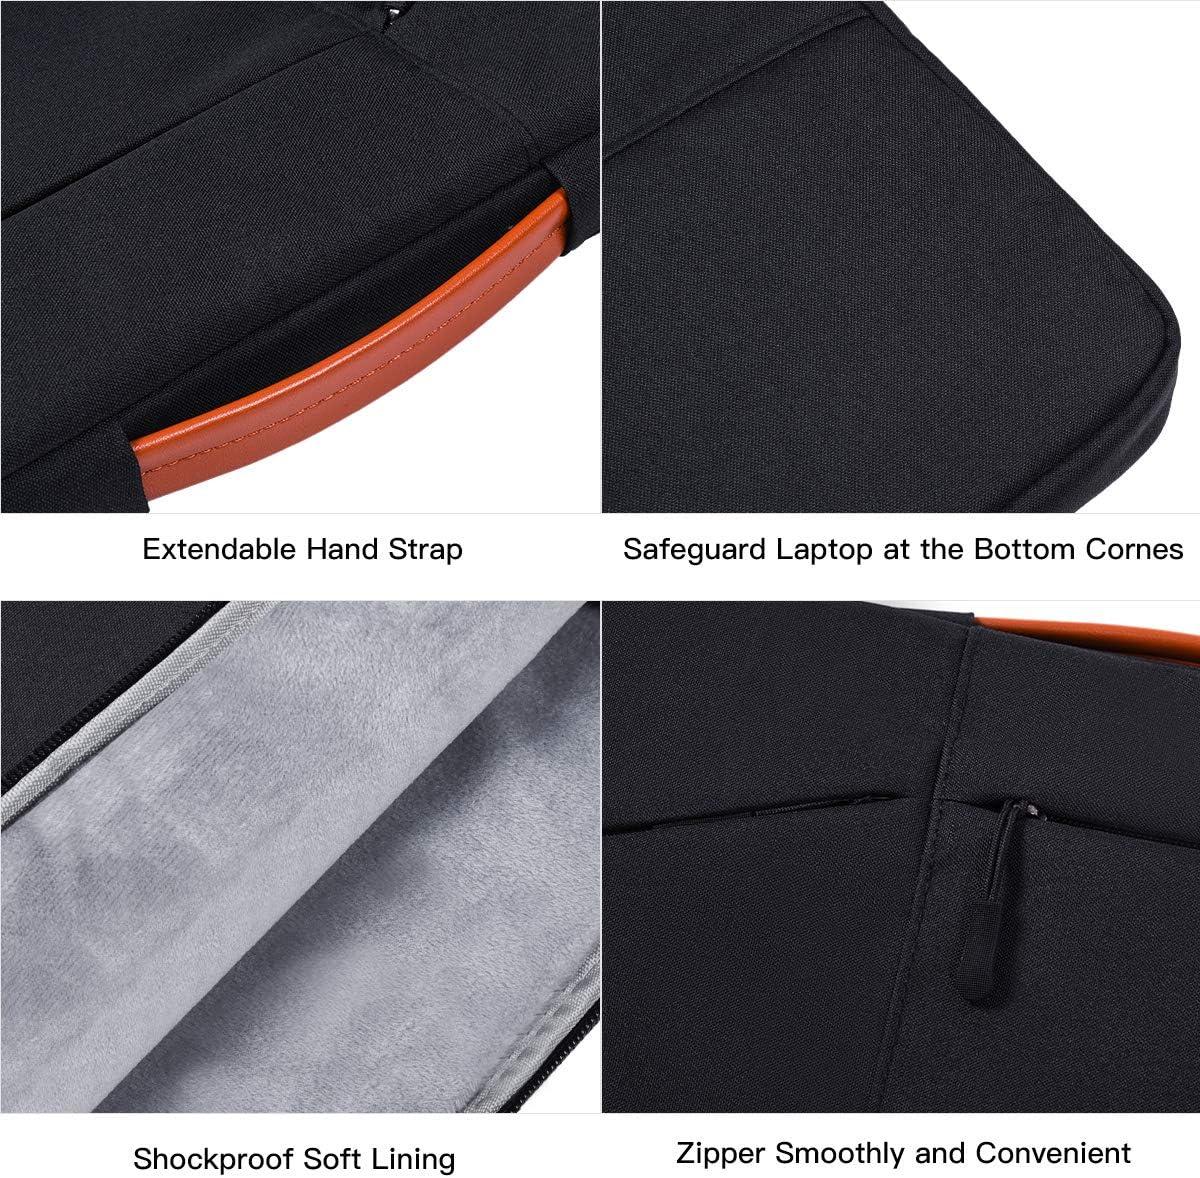 11.6-12.9 Inch Laptop Case for Samsung Chromebook Plus V2//Chromebook 3 Black Surface Pro X//7 Dell Inspiron Chromebook 11 Acer Asus Chromebook Vivobook 11.6 Inch Lenovo 11.6 Chromebook 100e